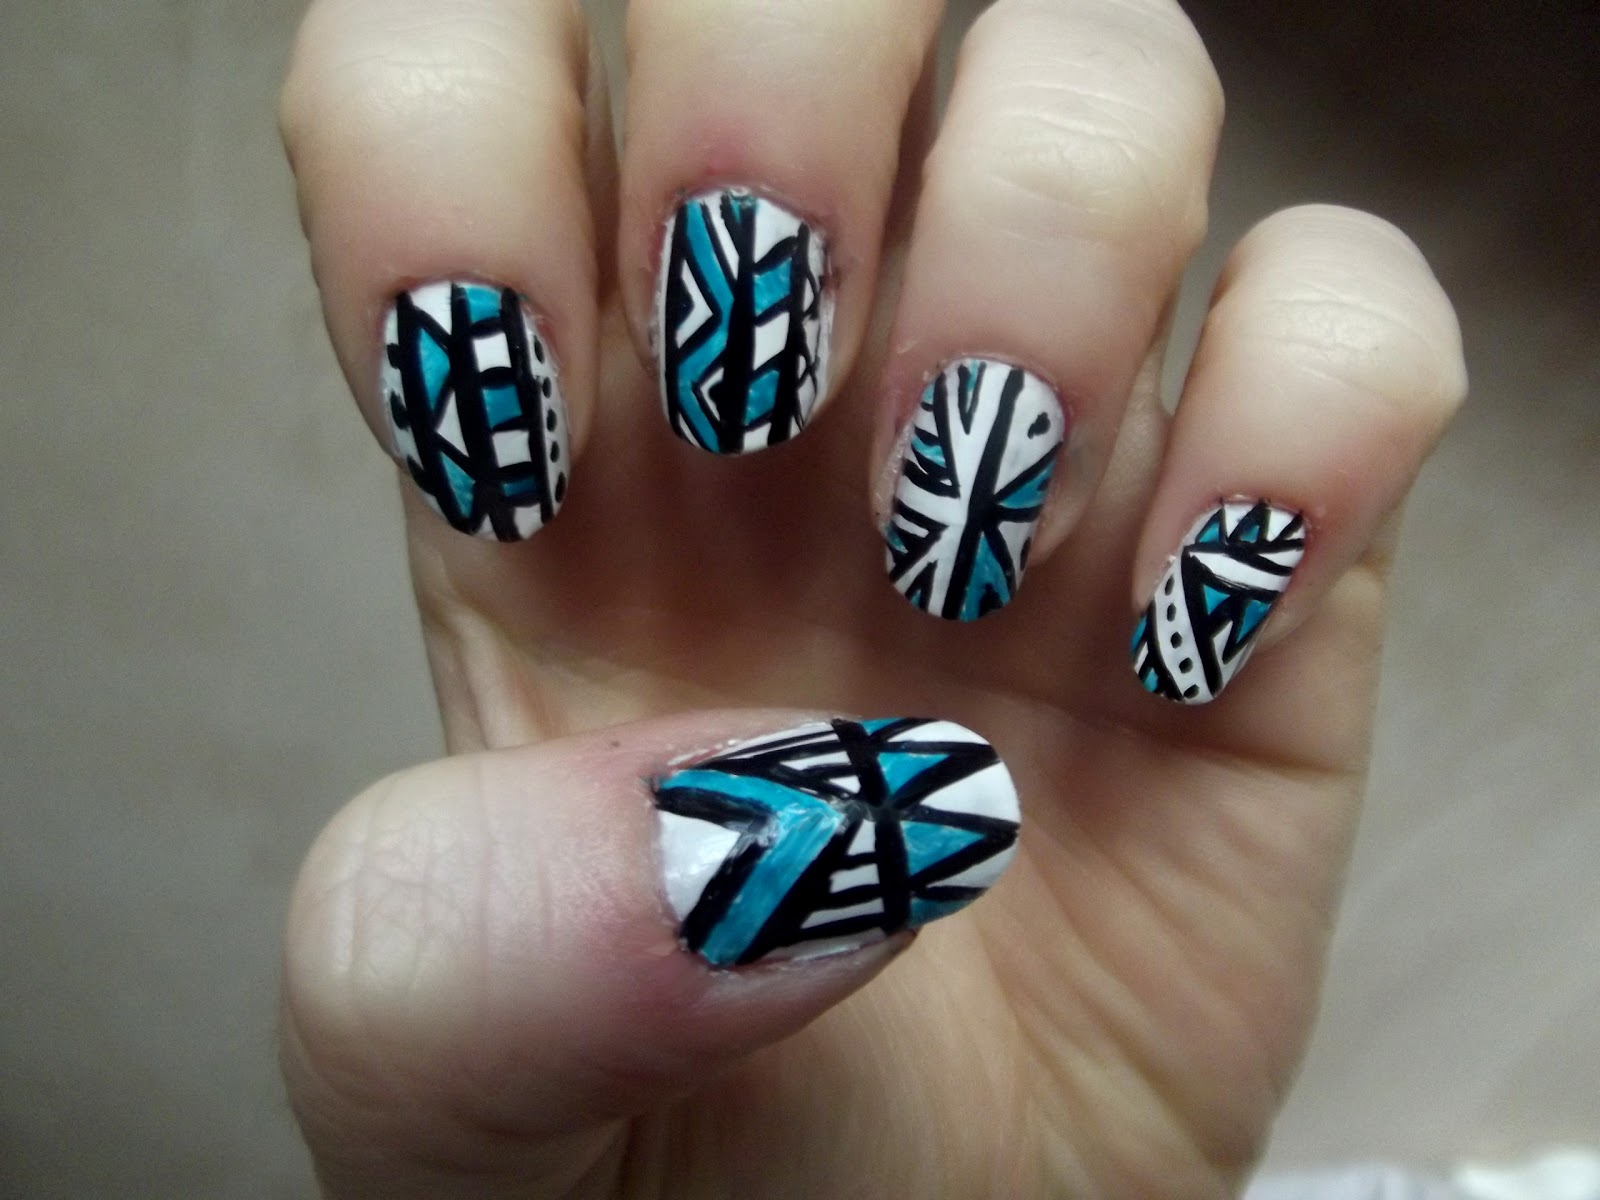 Aztec Nail Designs - Pccala